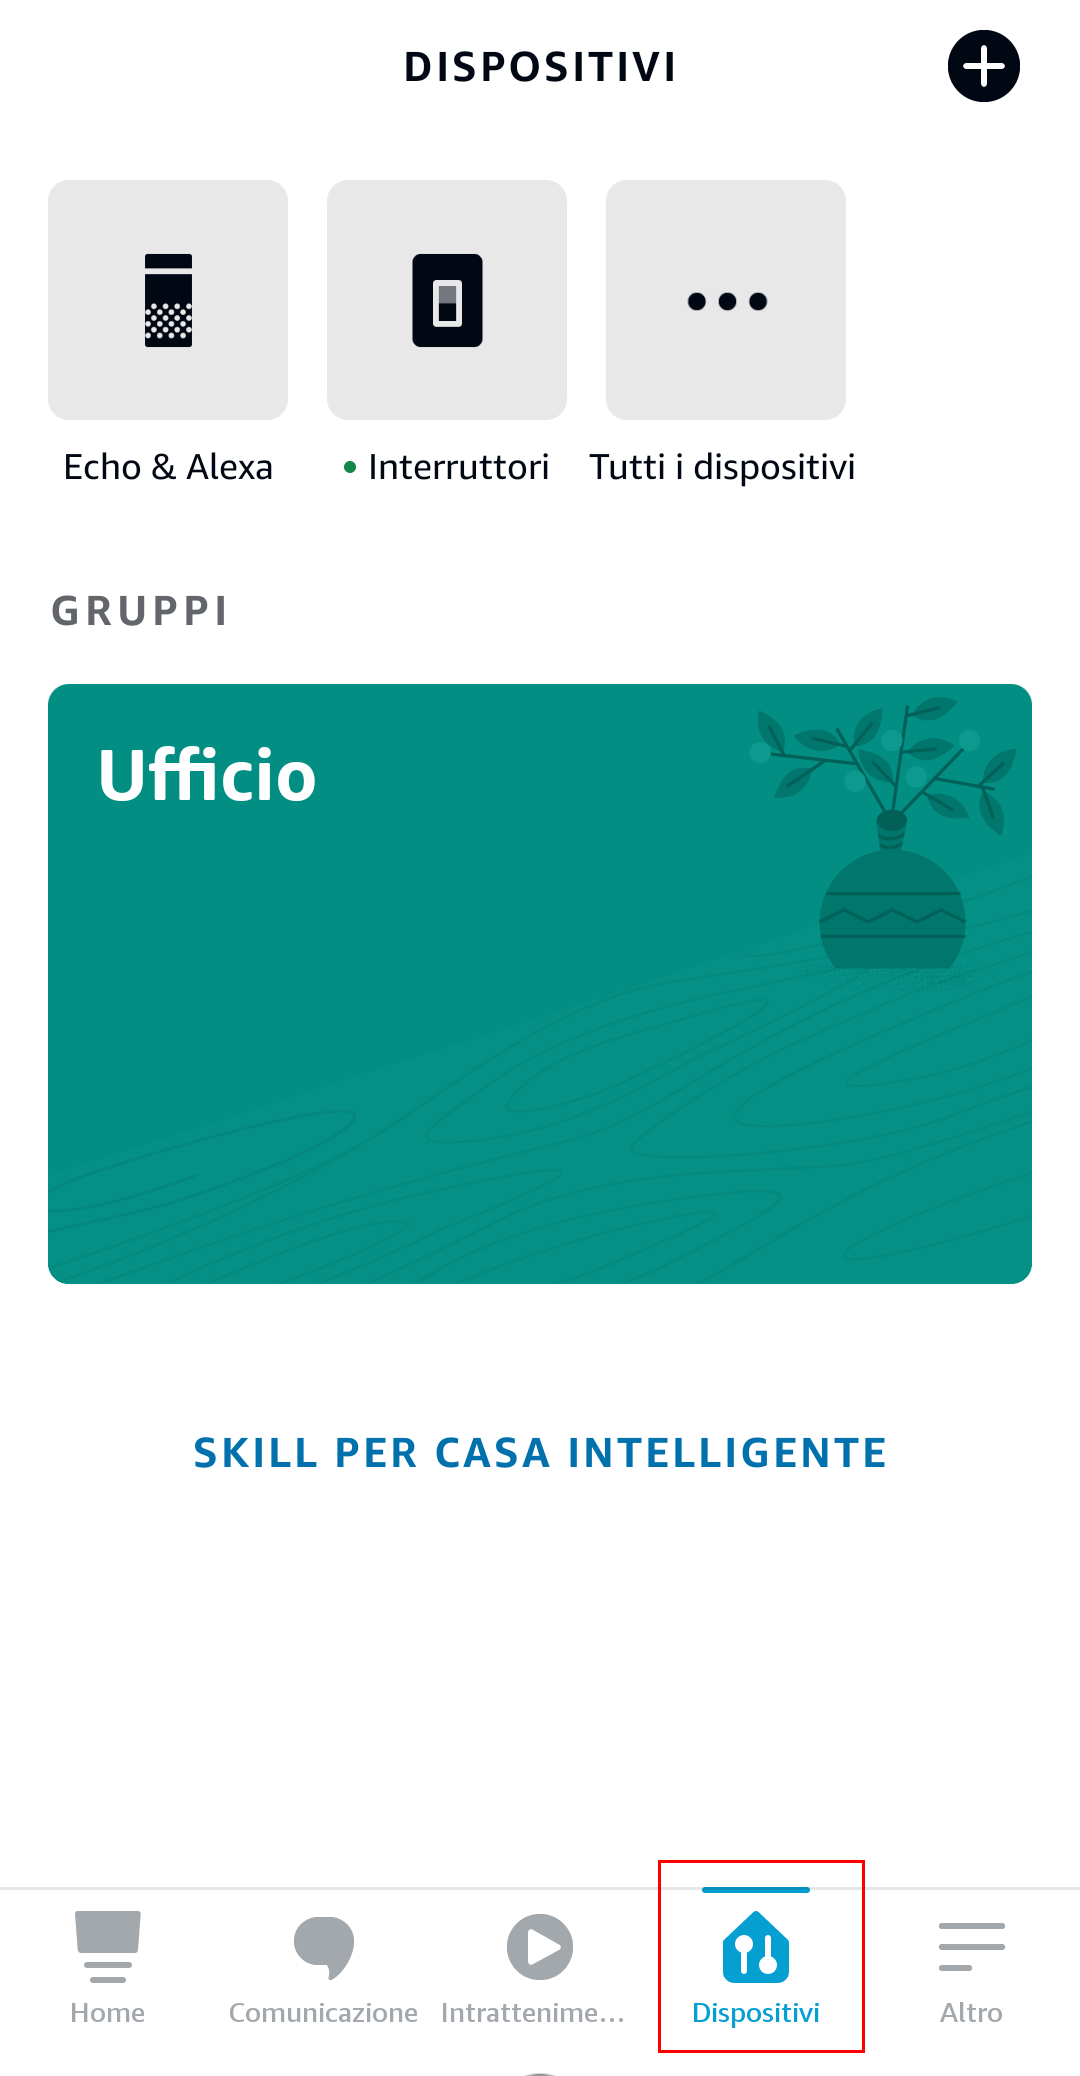 https://www.1control.eu/guide/img/alexa/ita/Guida_alexa_1_ita.png